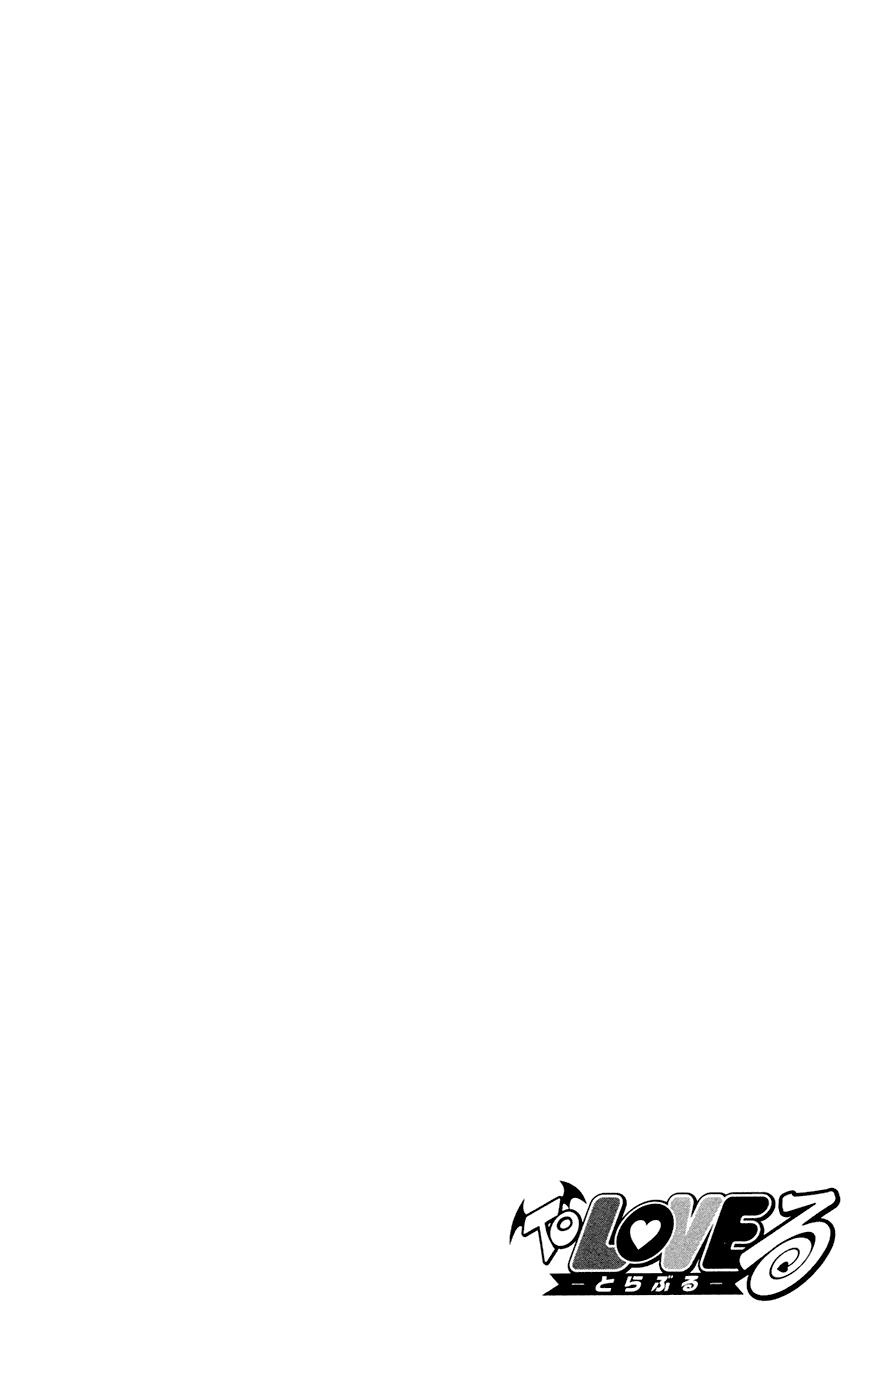 Манга Любовные неприятности / To Love-Ru  - Том 13 Глава 115 Страница 20